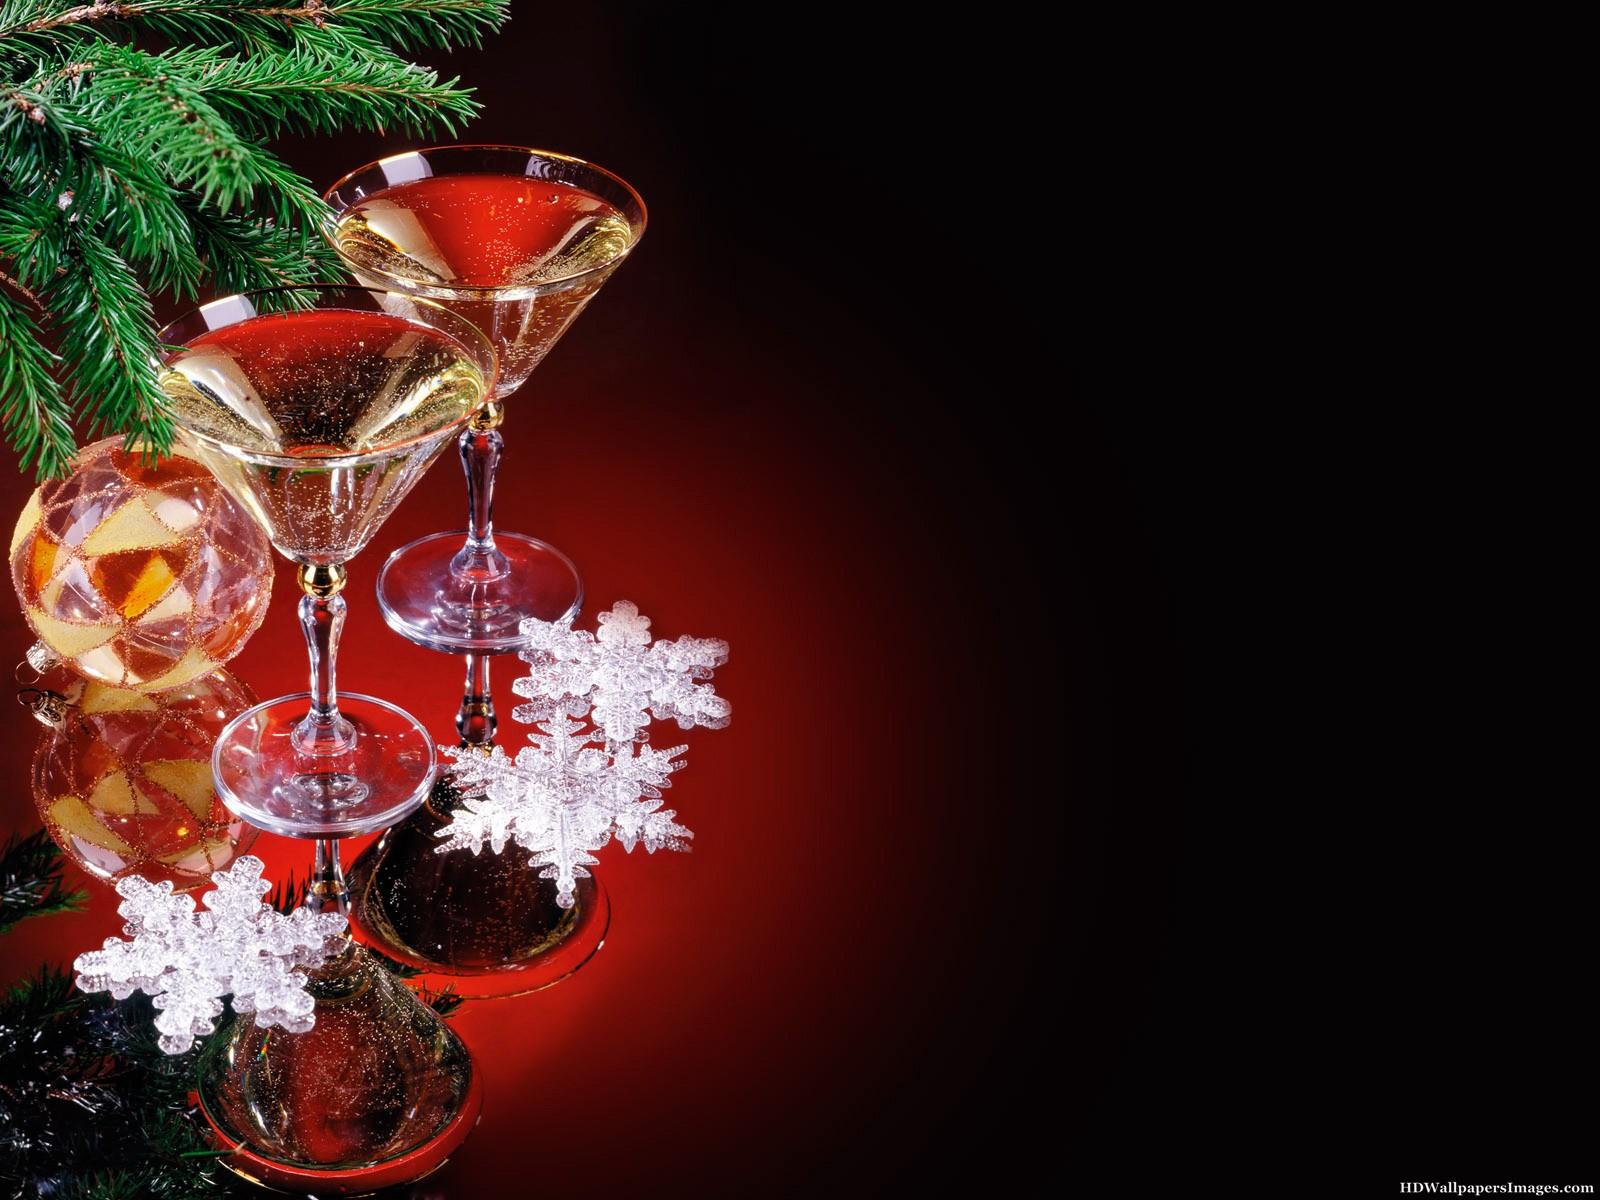 Taças_Champagne_Boas_festas- (5)